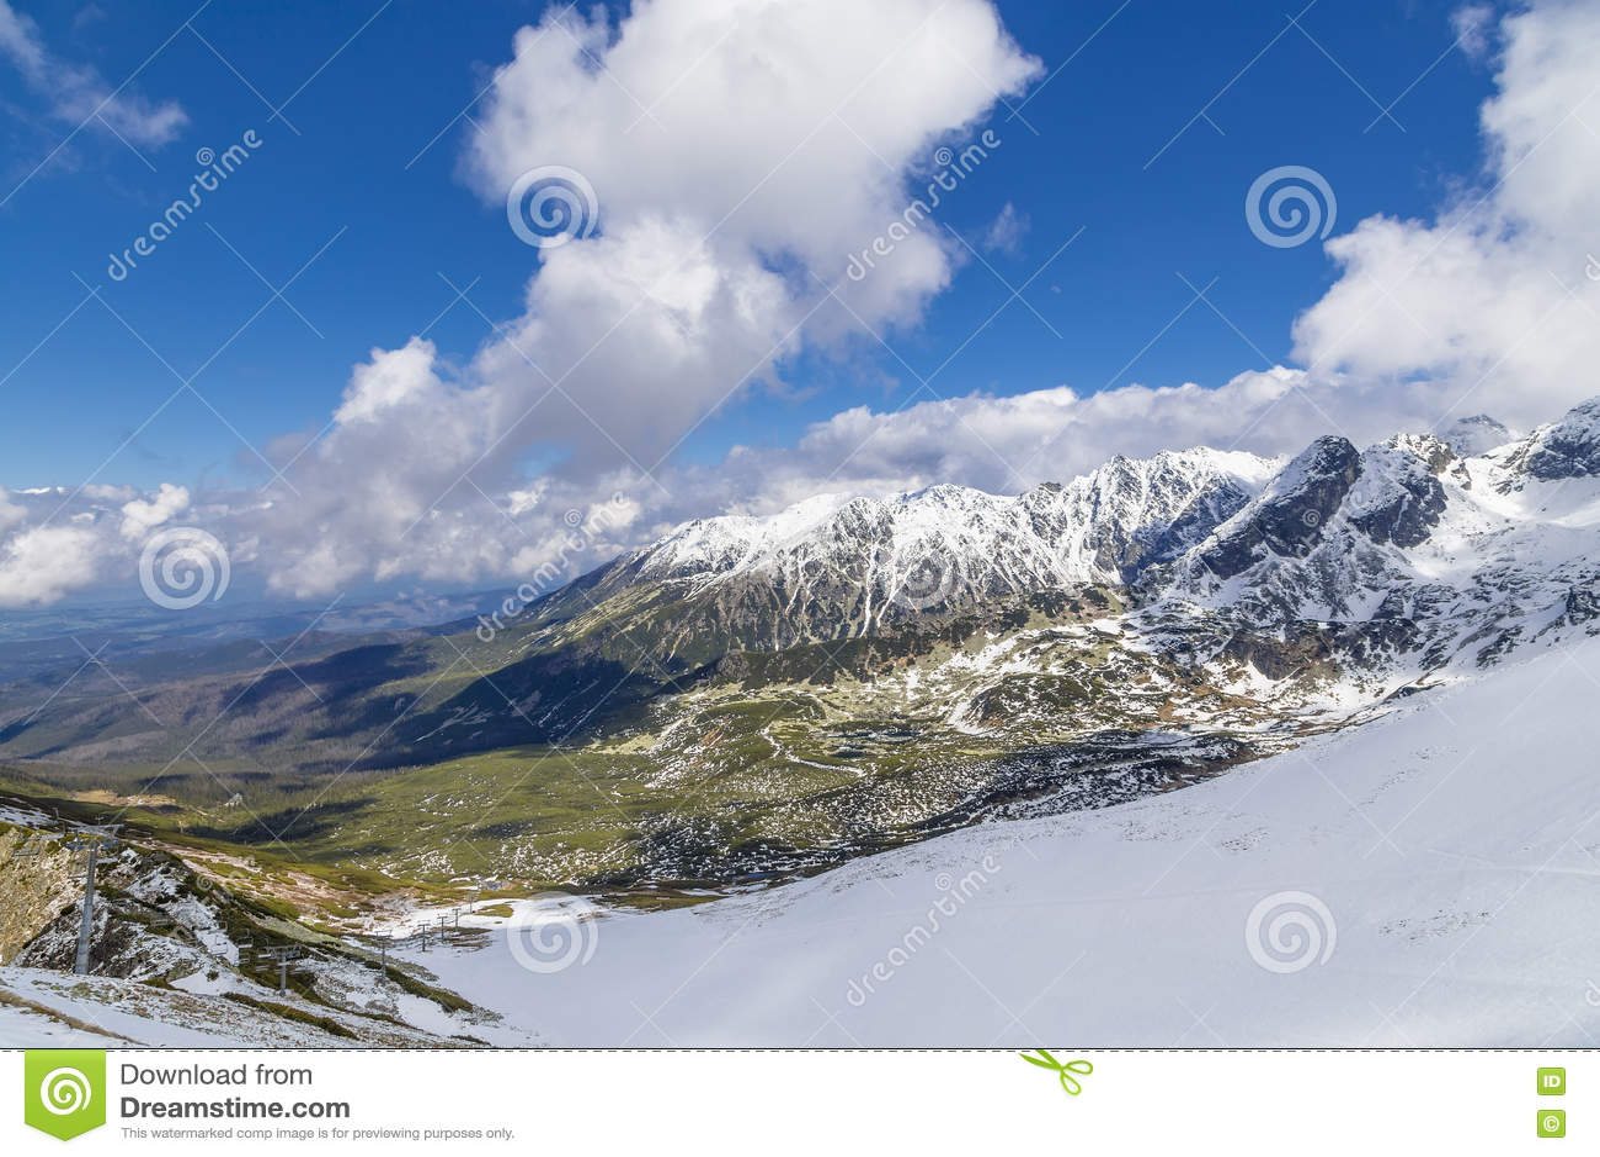 Ski Resort In Zakopane Stock Photo Image Of Resort Landmark 78637534